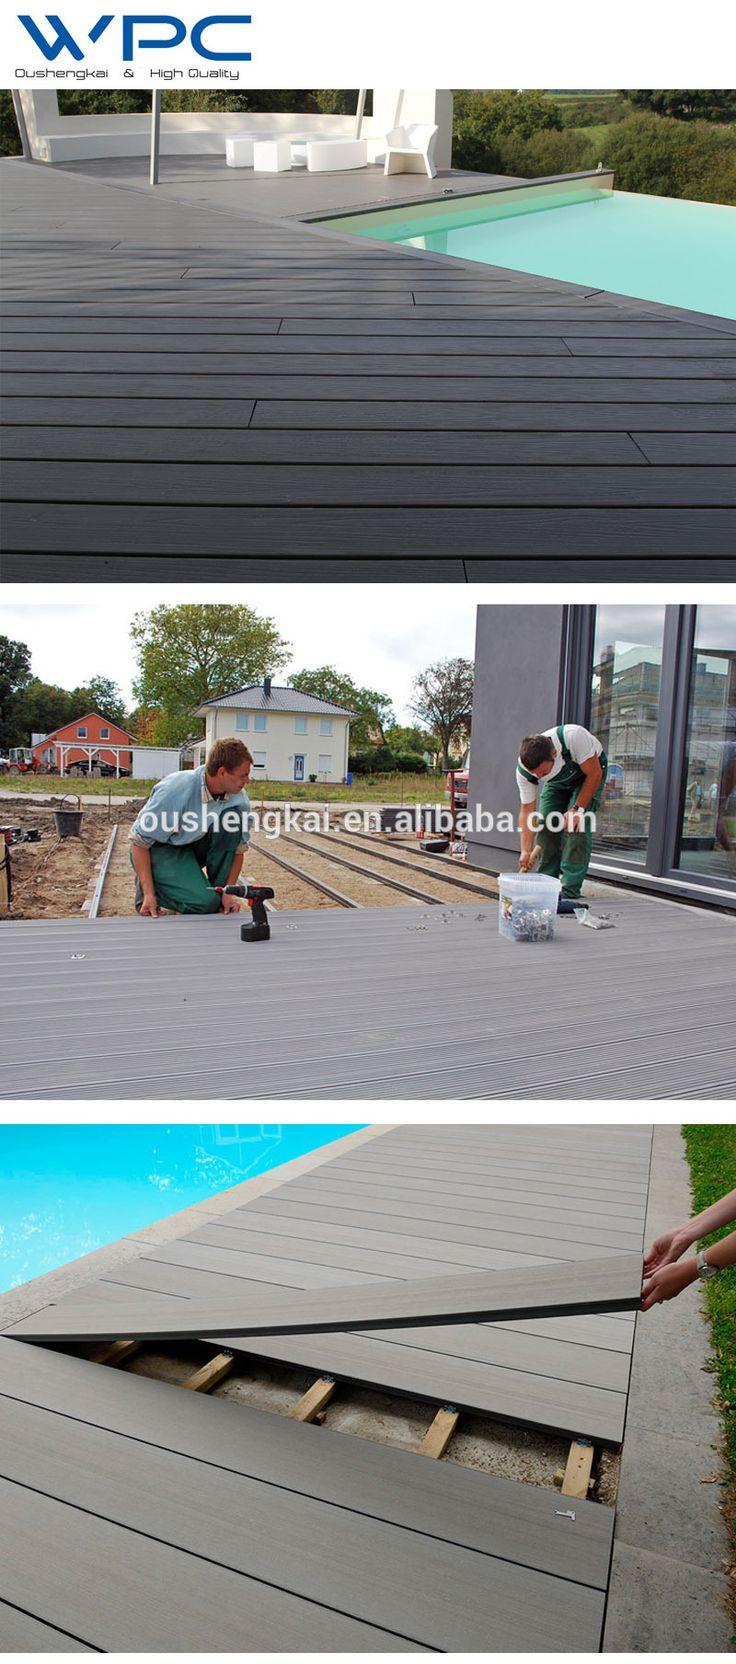 Cheap Price WPC Waterproof Outdoor Deck Flooring, View Deck Flooring, OUSHENGKAI / OEM Product Details from Haining Oushengkai Trade Co., Ltd. on Alibaba.com